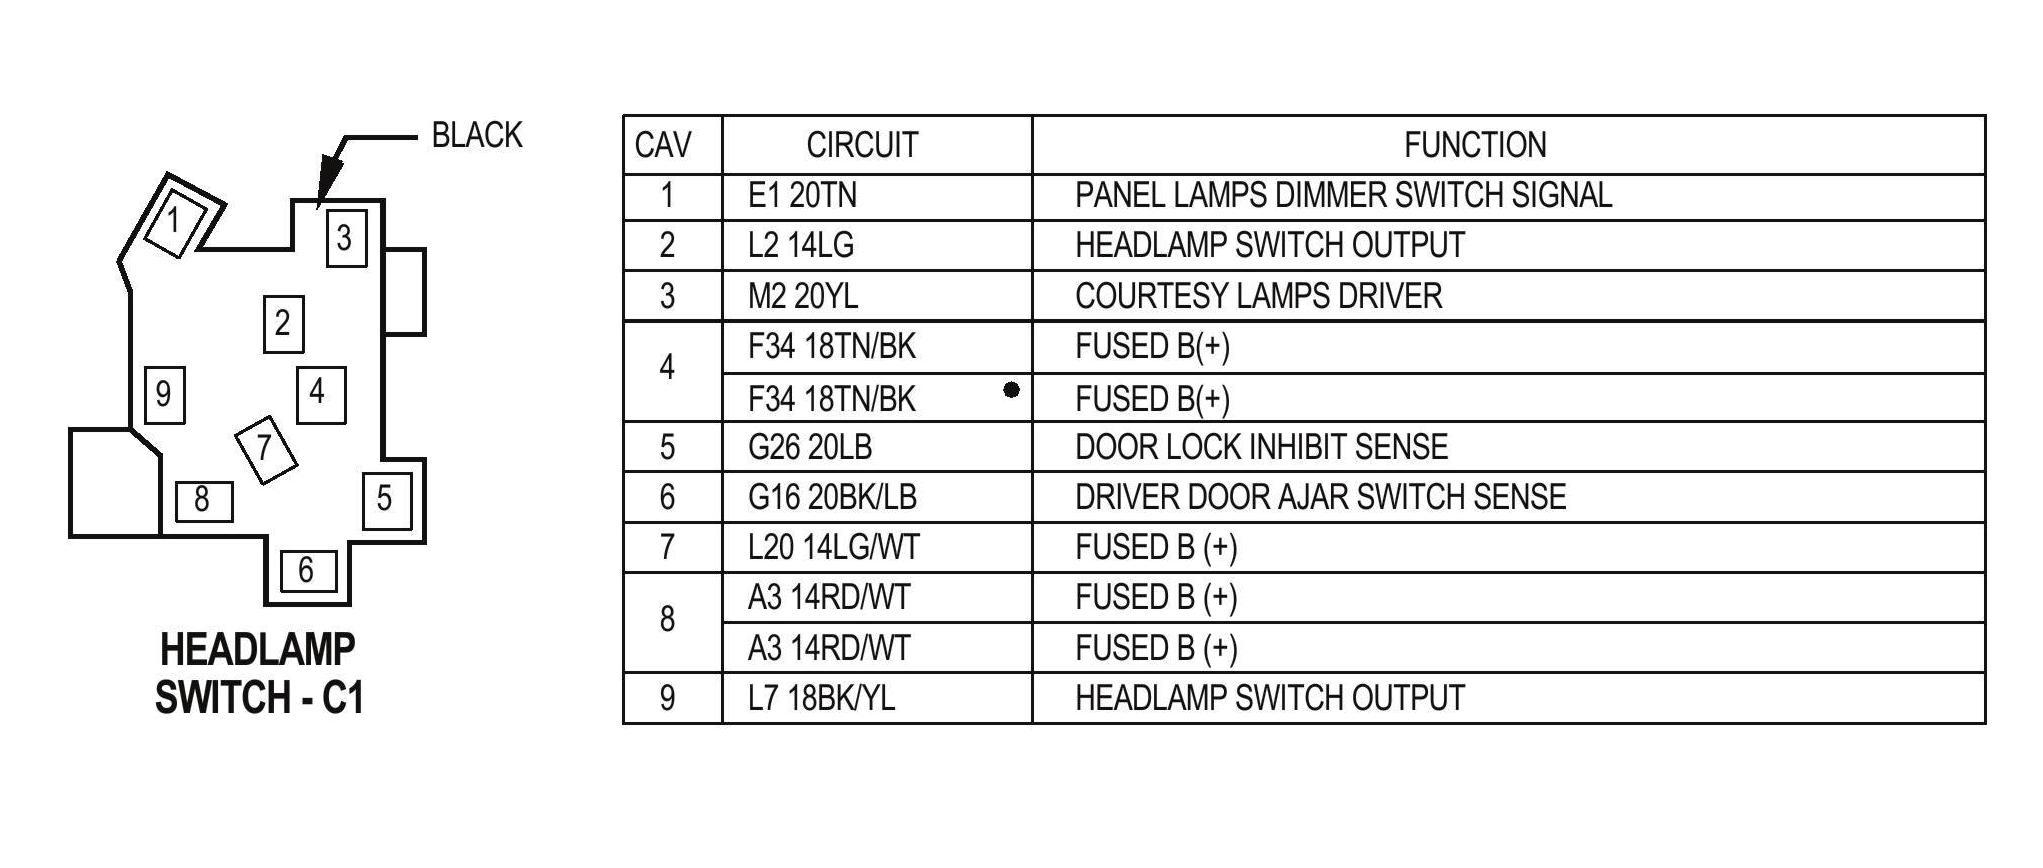 2000 jeep cherokee headlight switch wiring diagram class 5 dlc no power obd2 page 2 forum